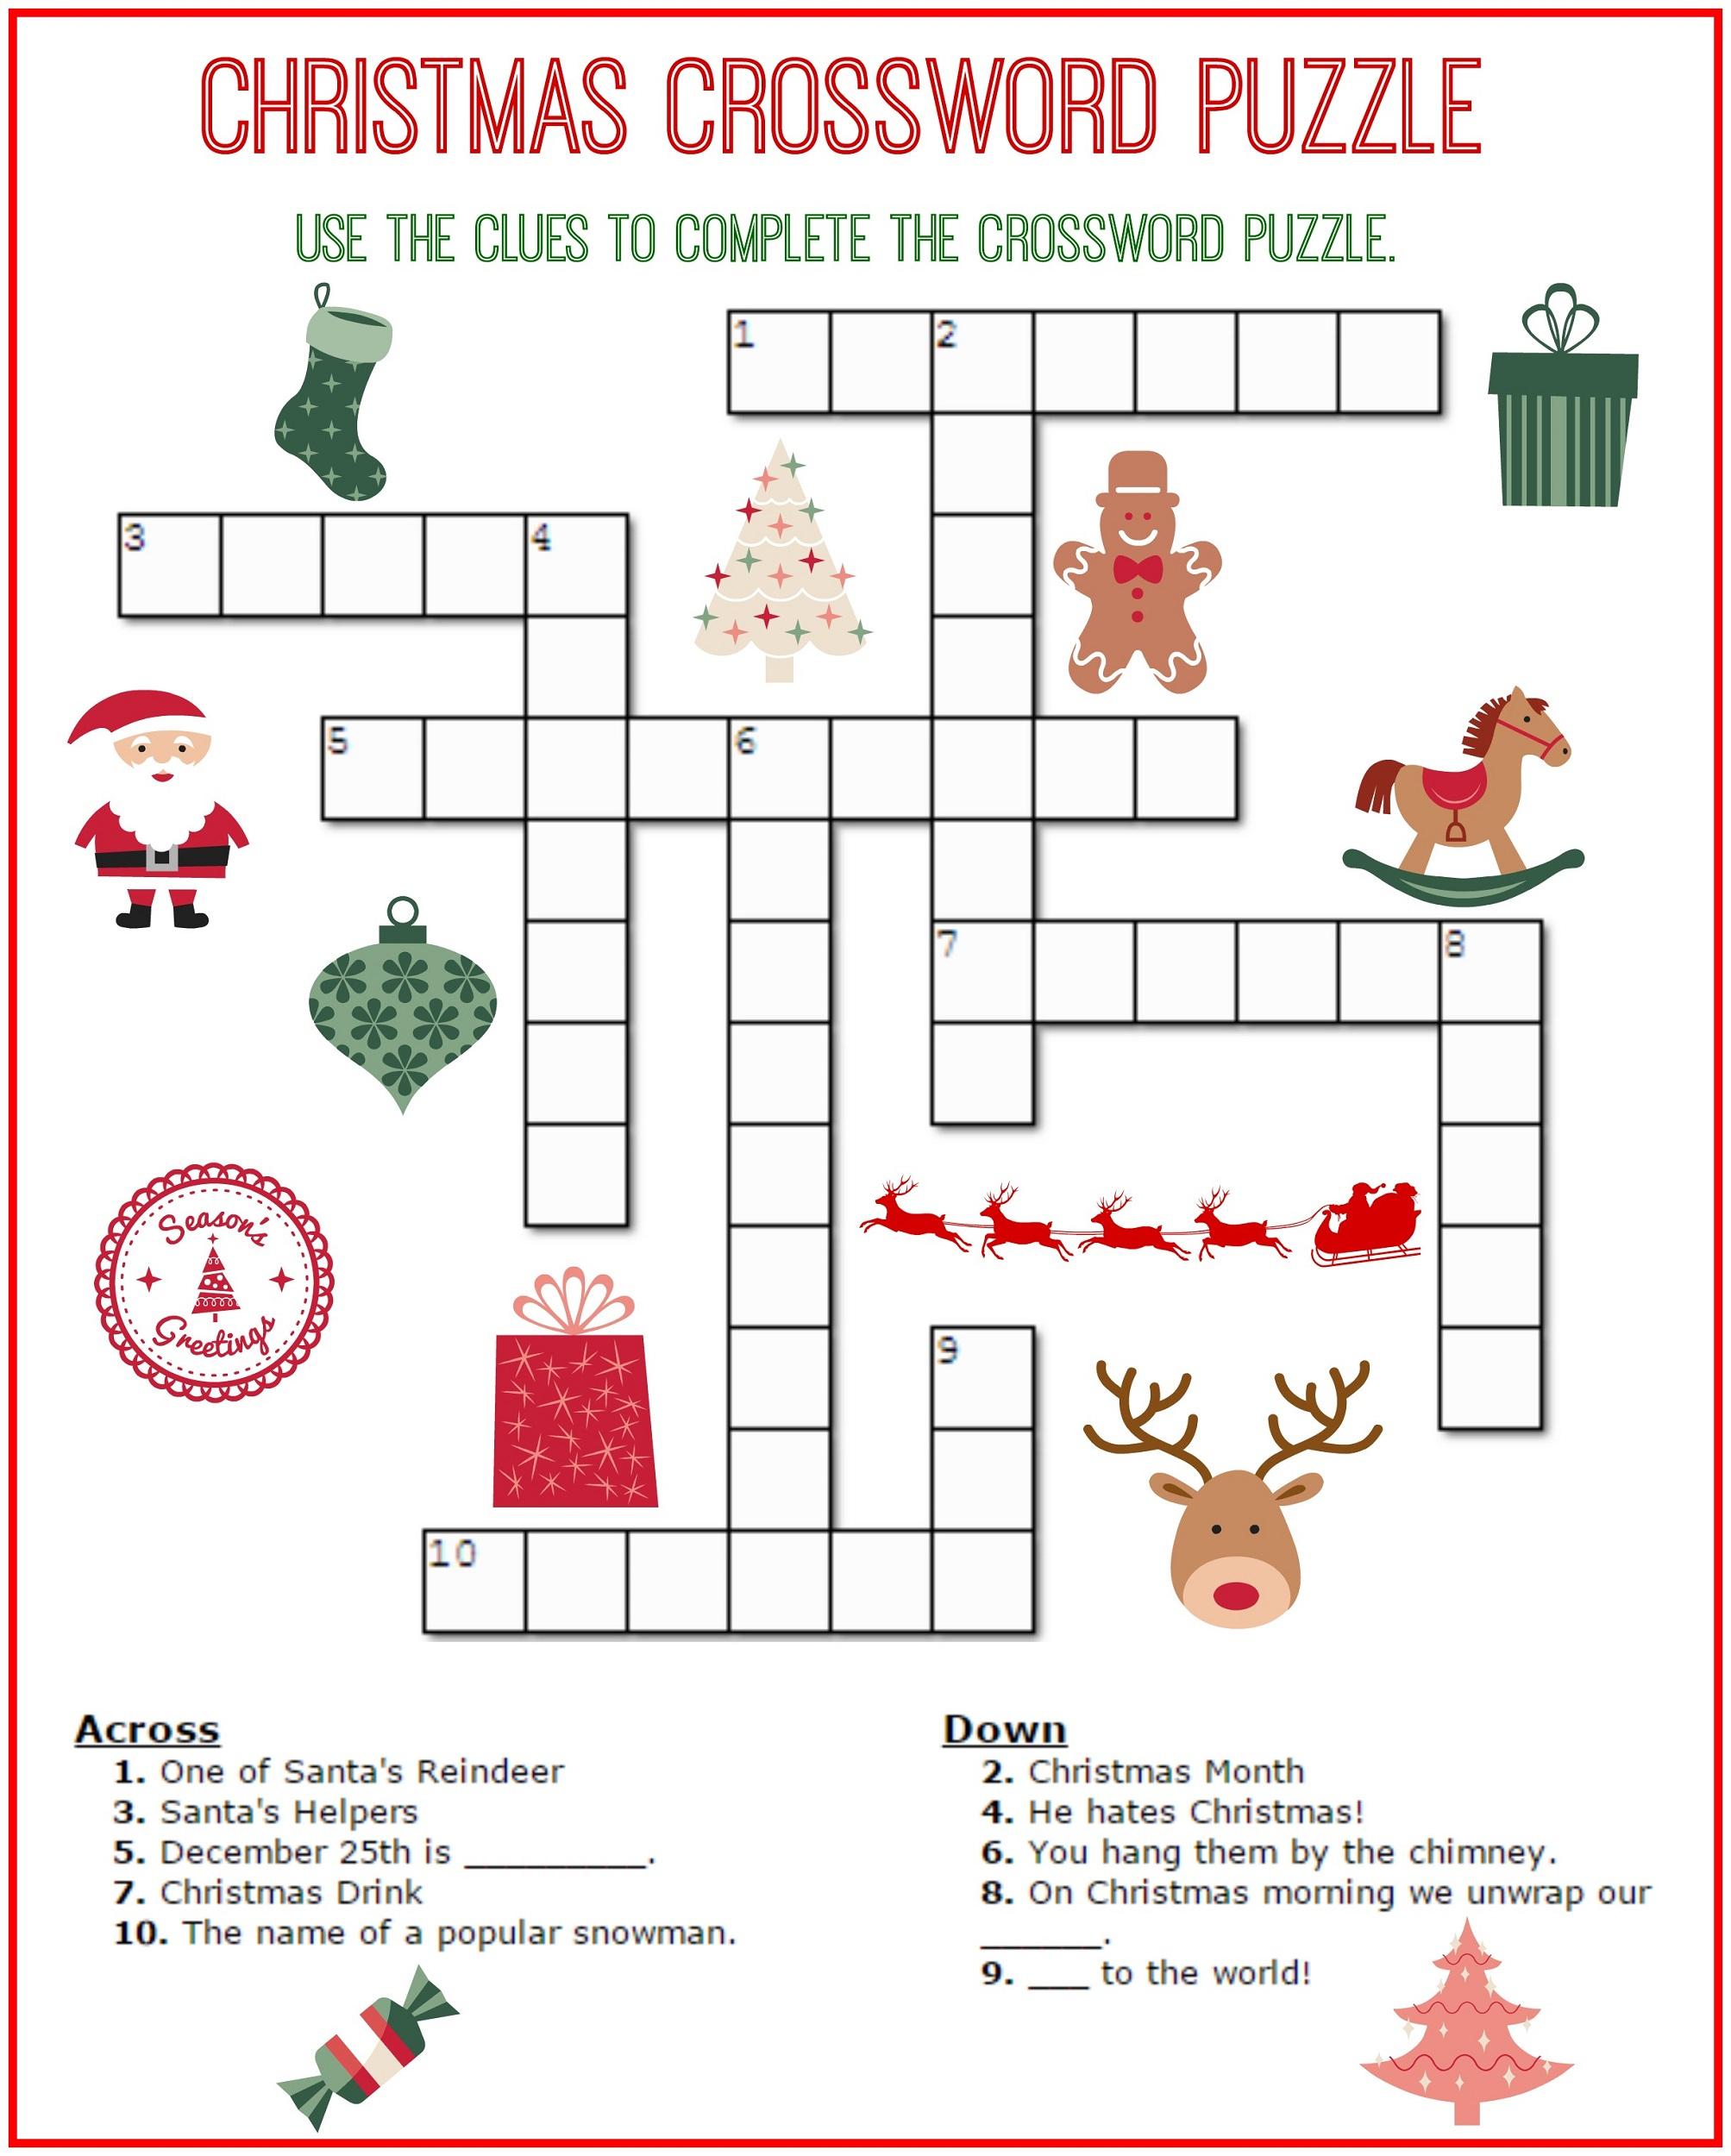 Crossword Puzzle Kids Printable 2017   Kiddo Shelter - Free Easy - Easy Crossword Puzzles Printable For Kids